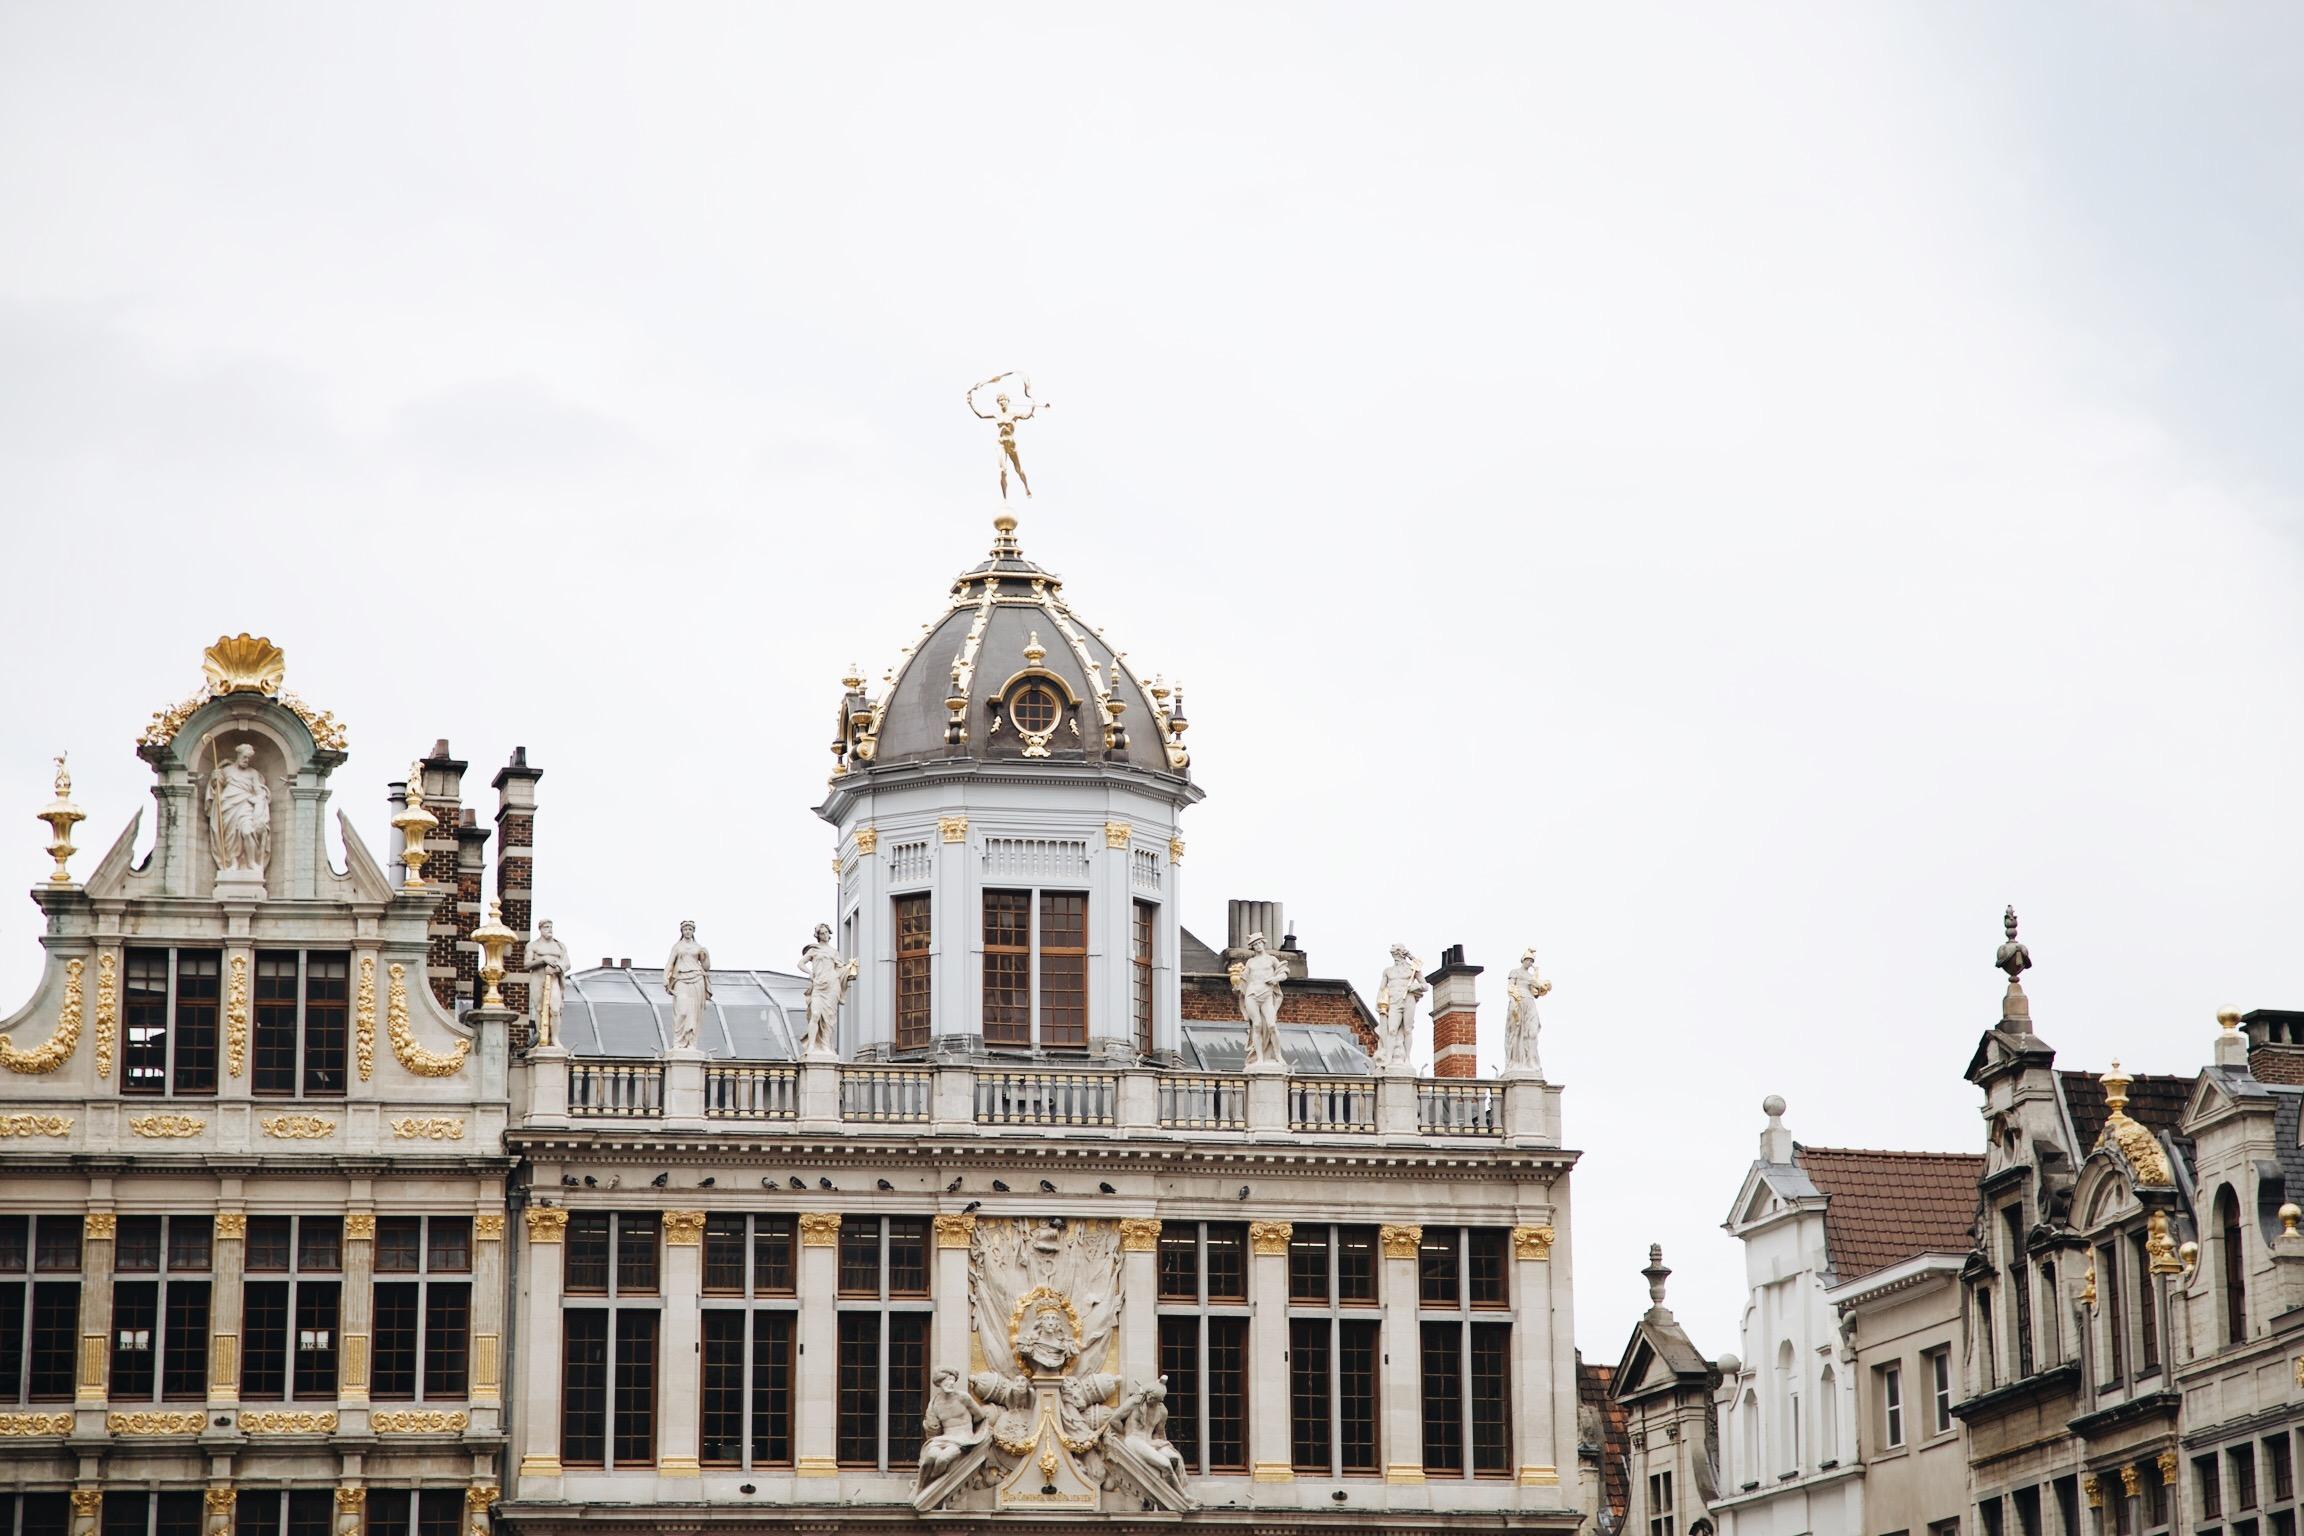 bruxelles-grand-place-architecture-voyage-aircorsica-vol-direct-europe.JPG